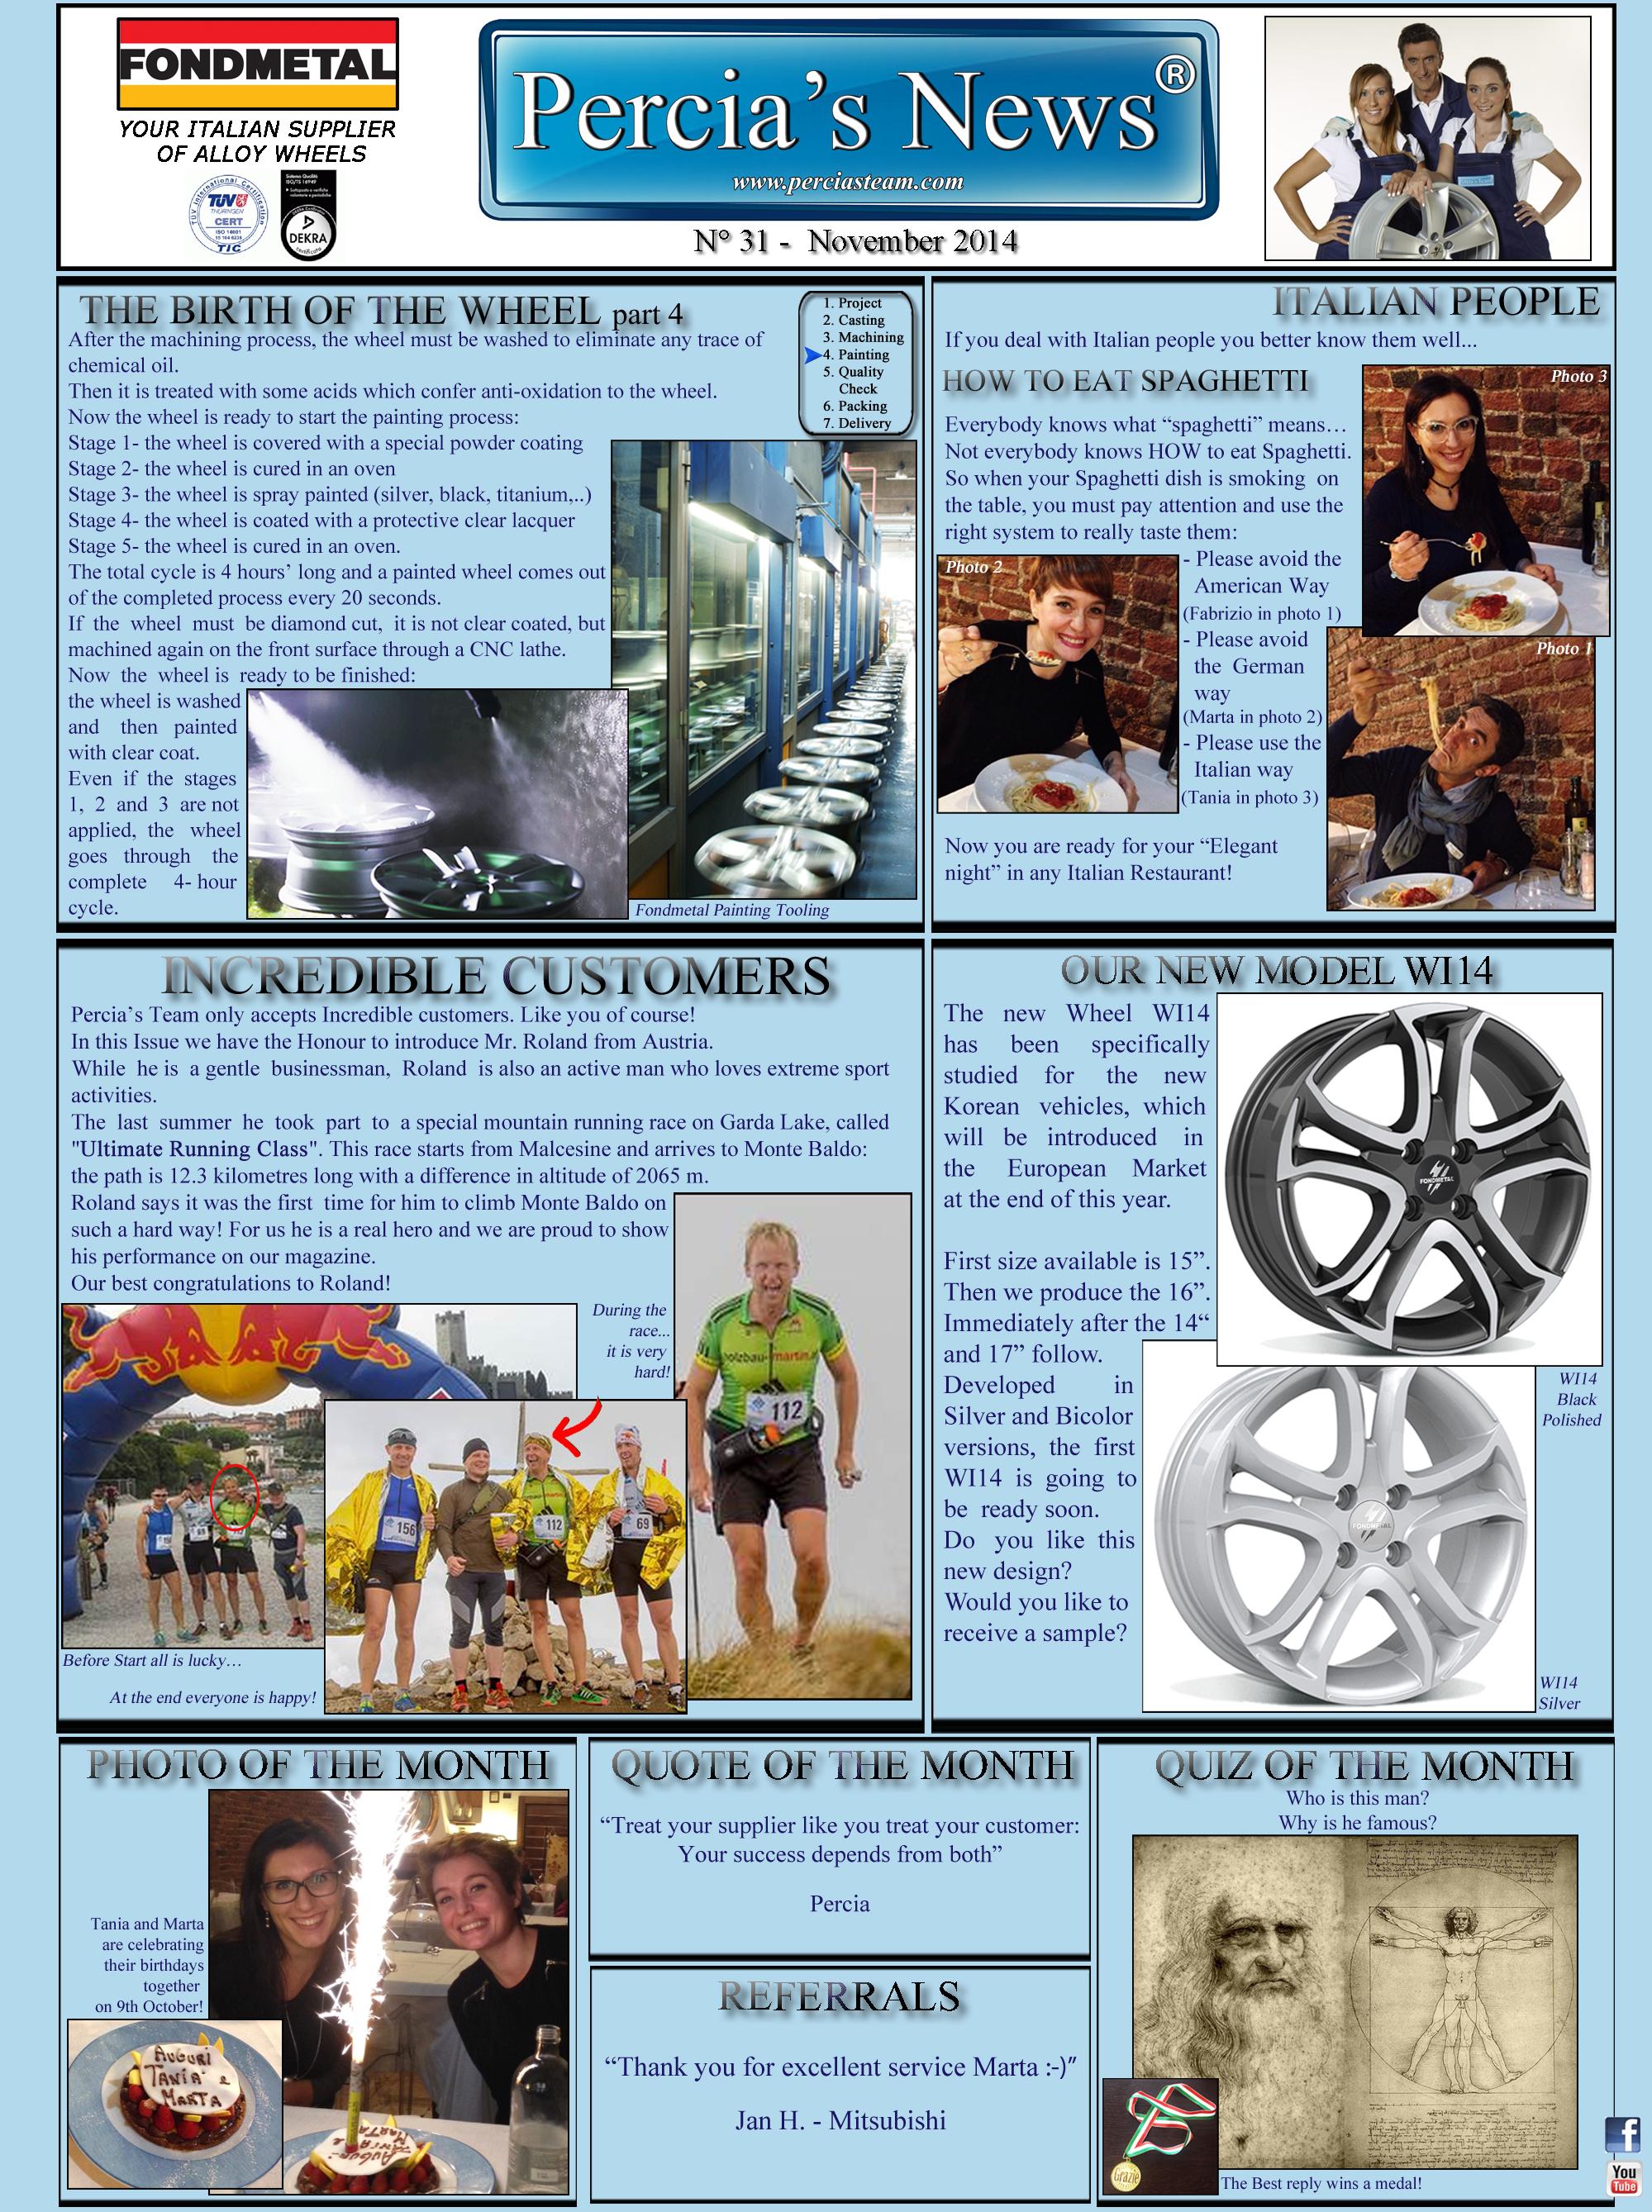 PERCIA'S NEWS NOVEMBER 2014